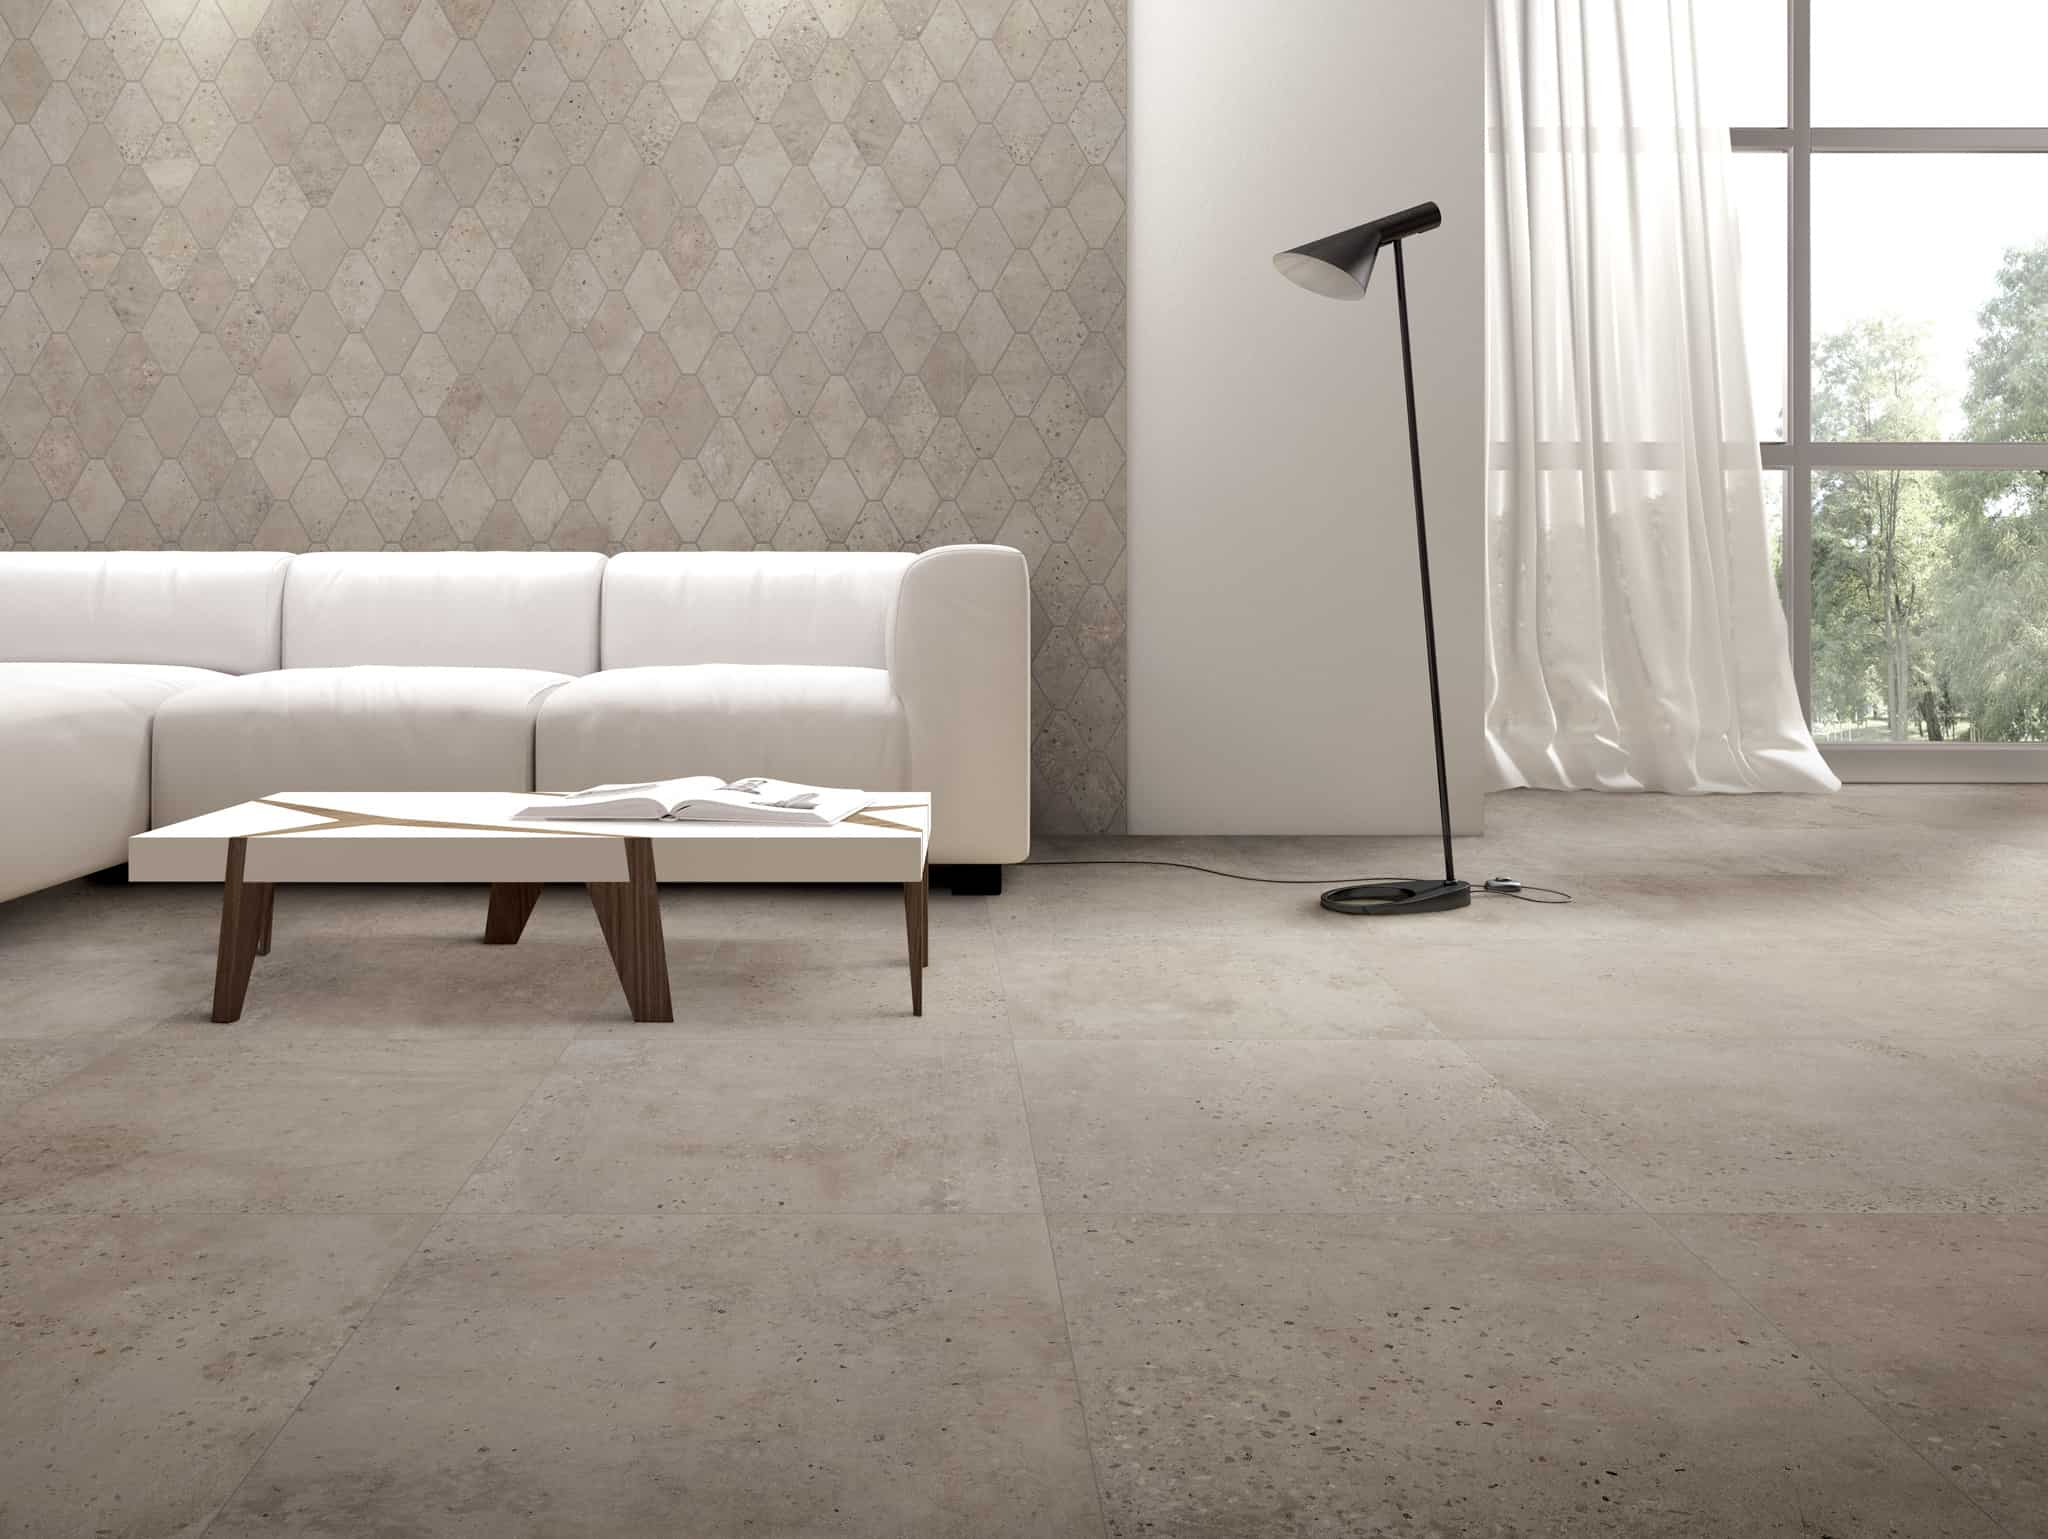 Urban-Concrete-Setting